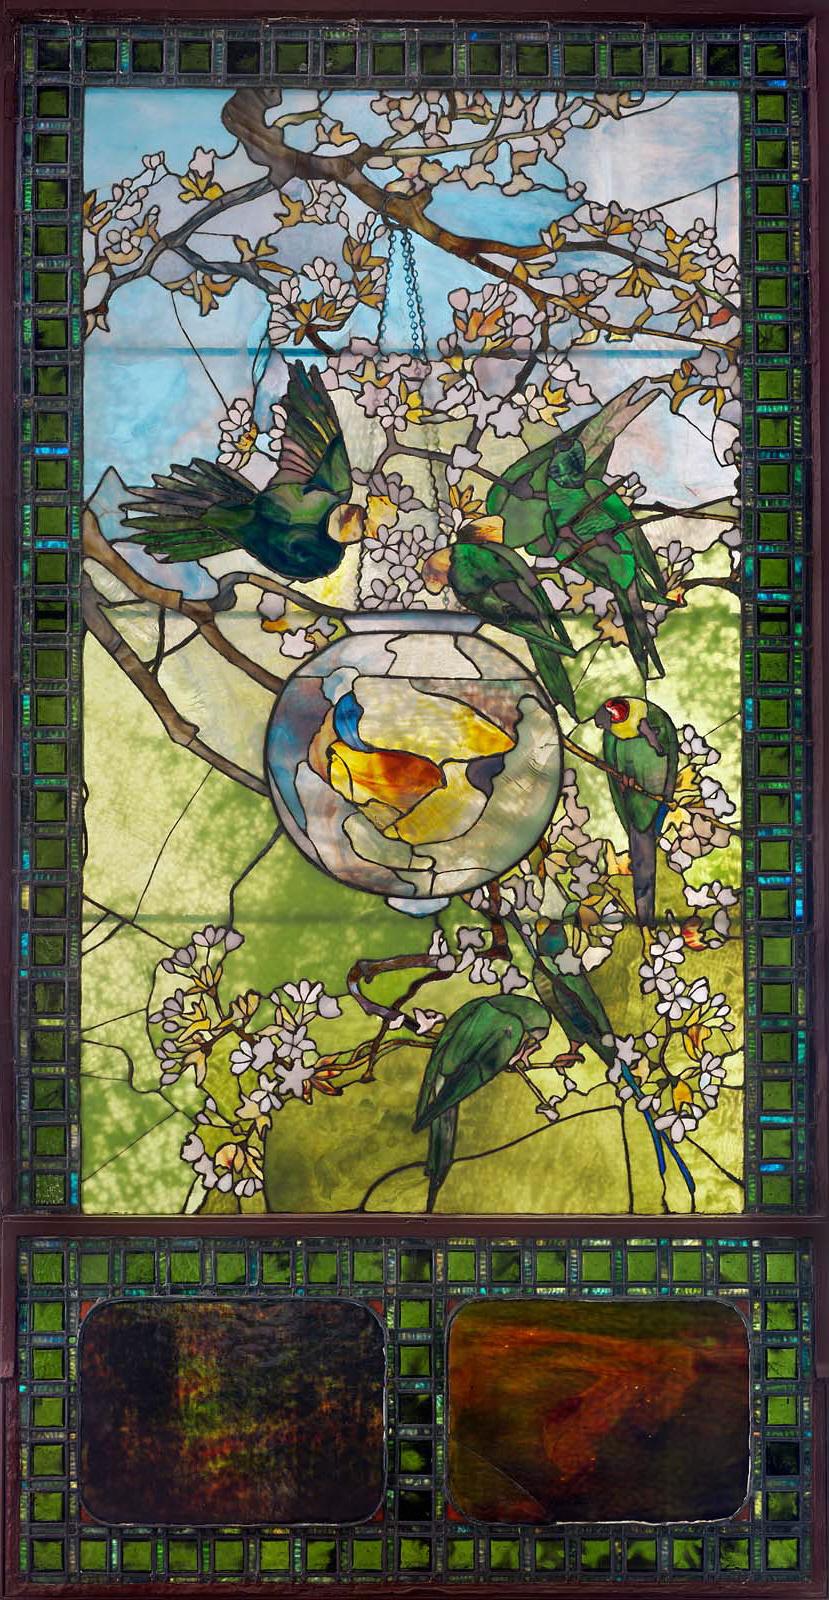 Bensozia Louis Comfort Tiffany Stained Glass Windows